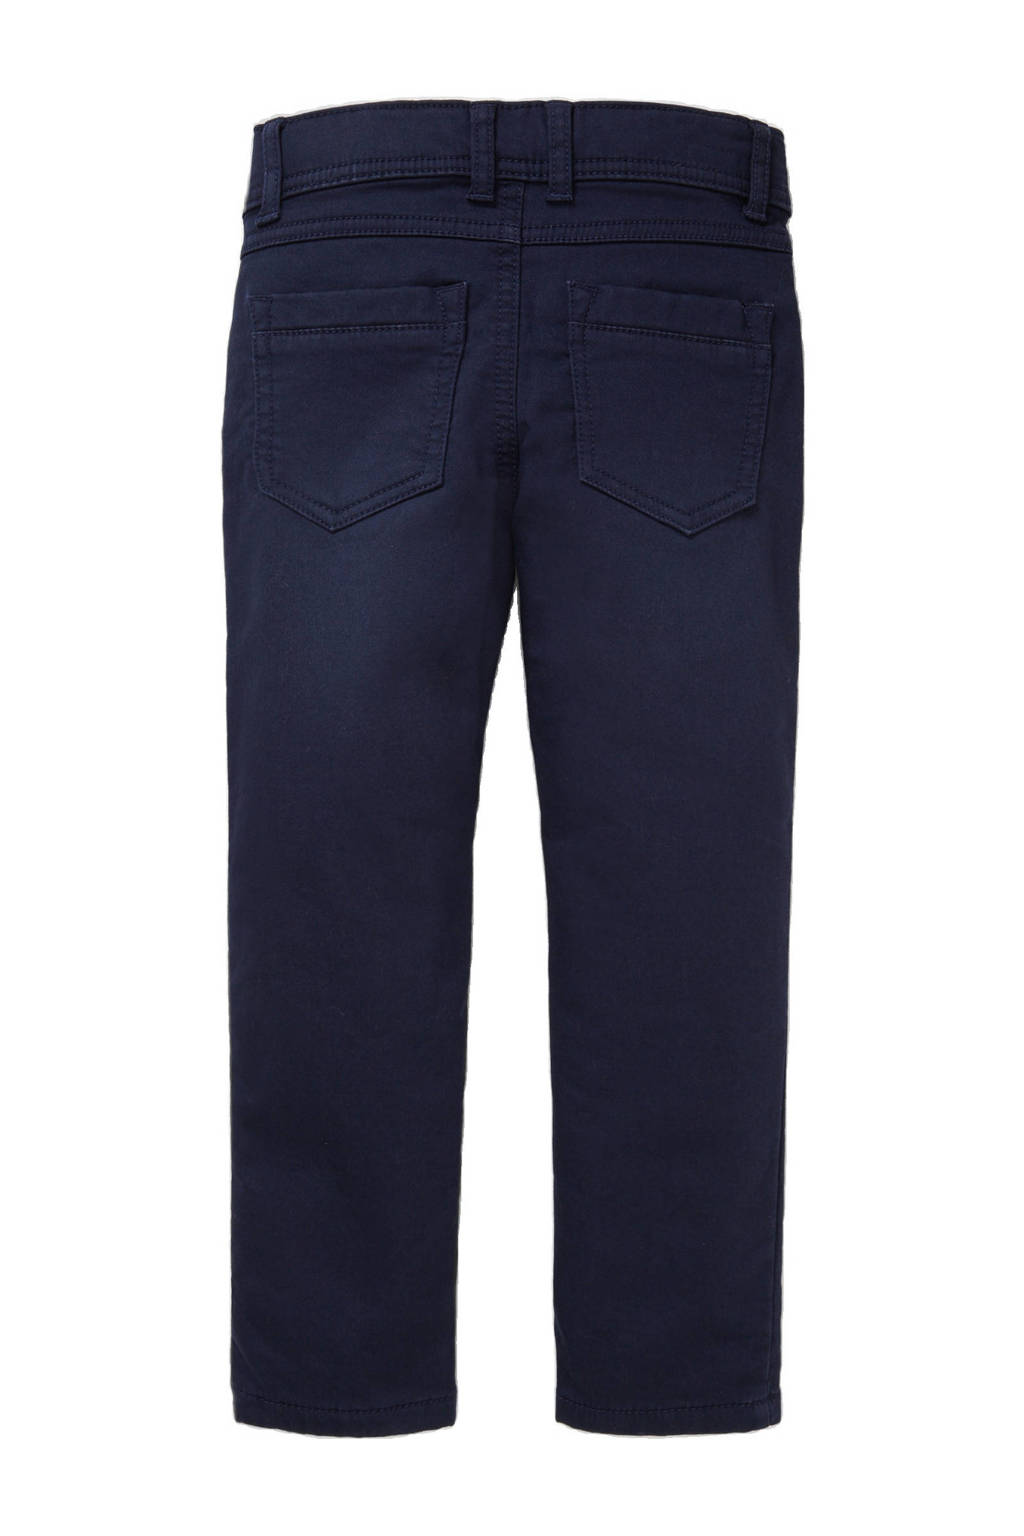 C&A Palomino slim fit broek donkerblauw, Donkerblauw